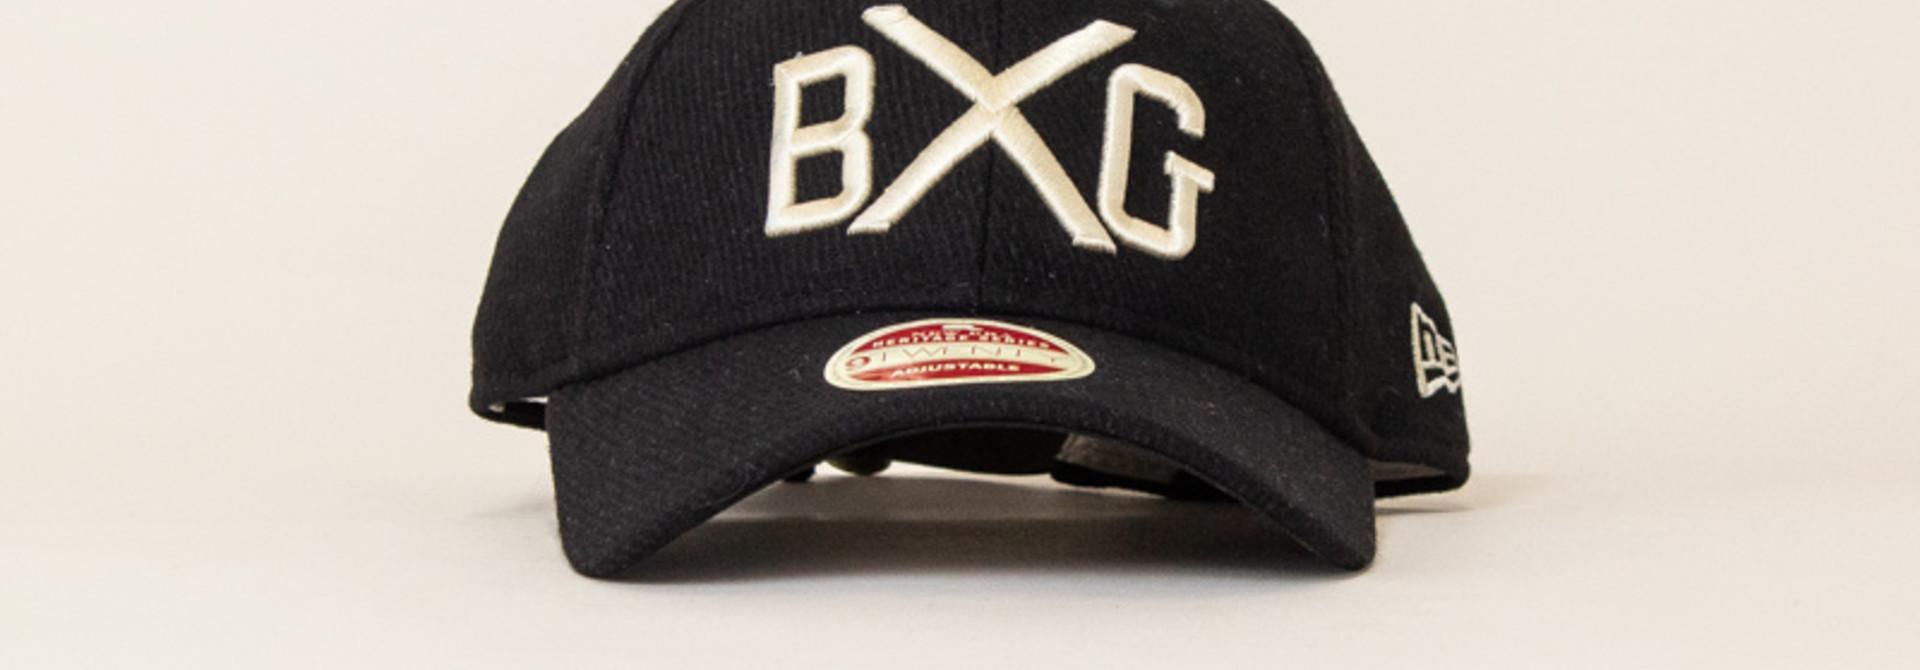 New Era Vintage Team Bacgia Strapback - Black/Cream